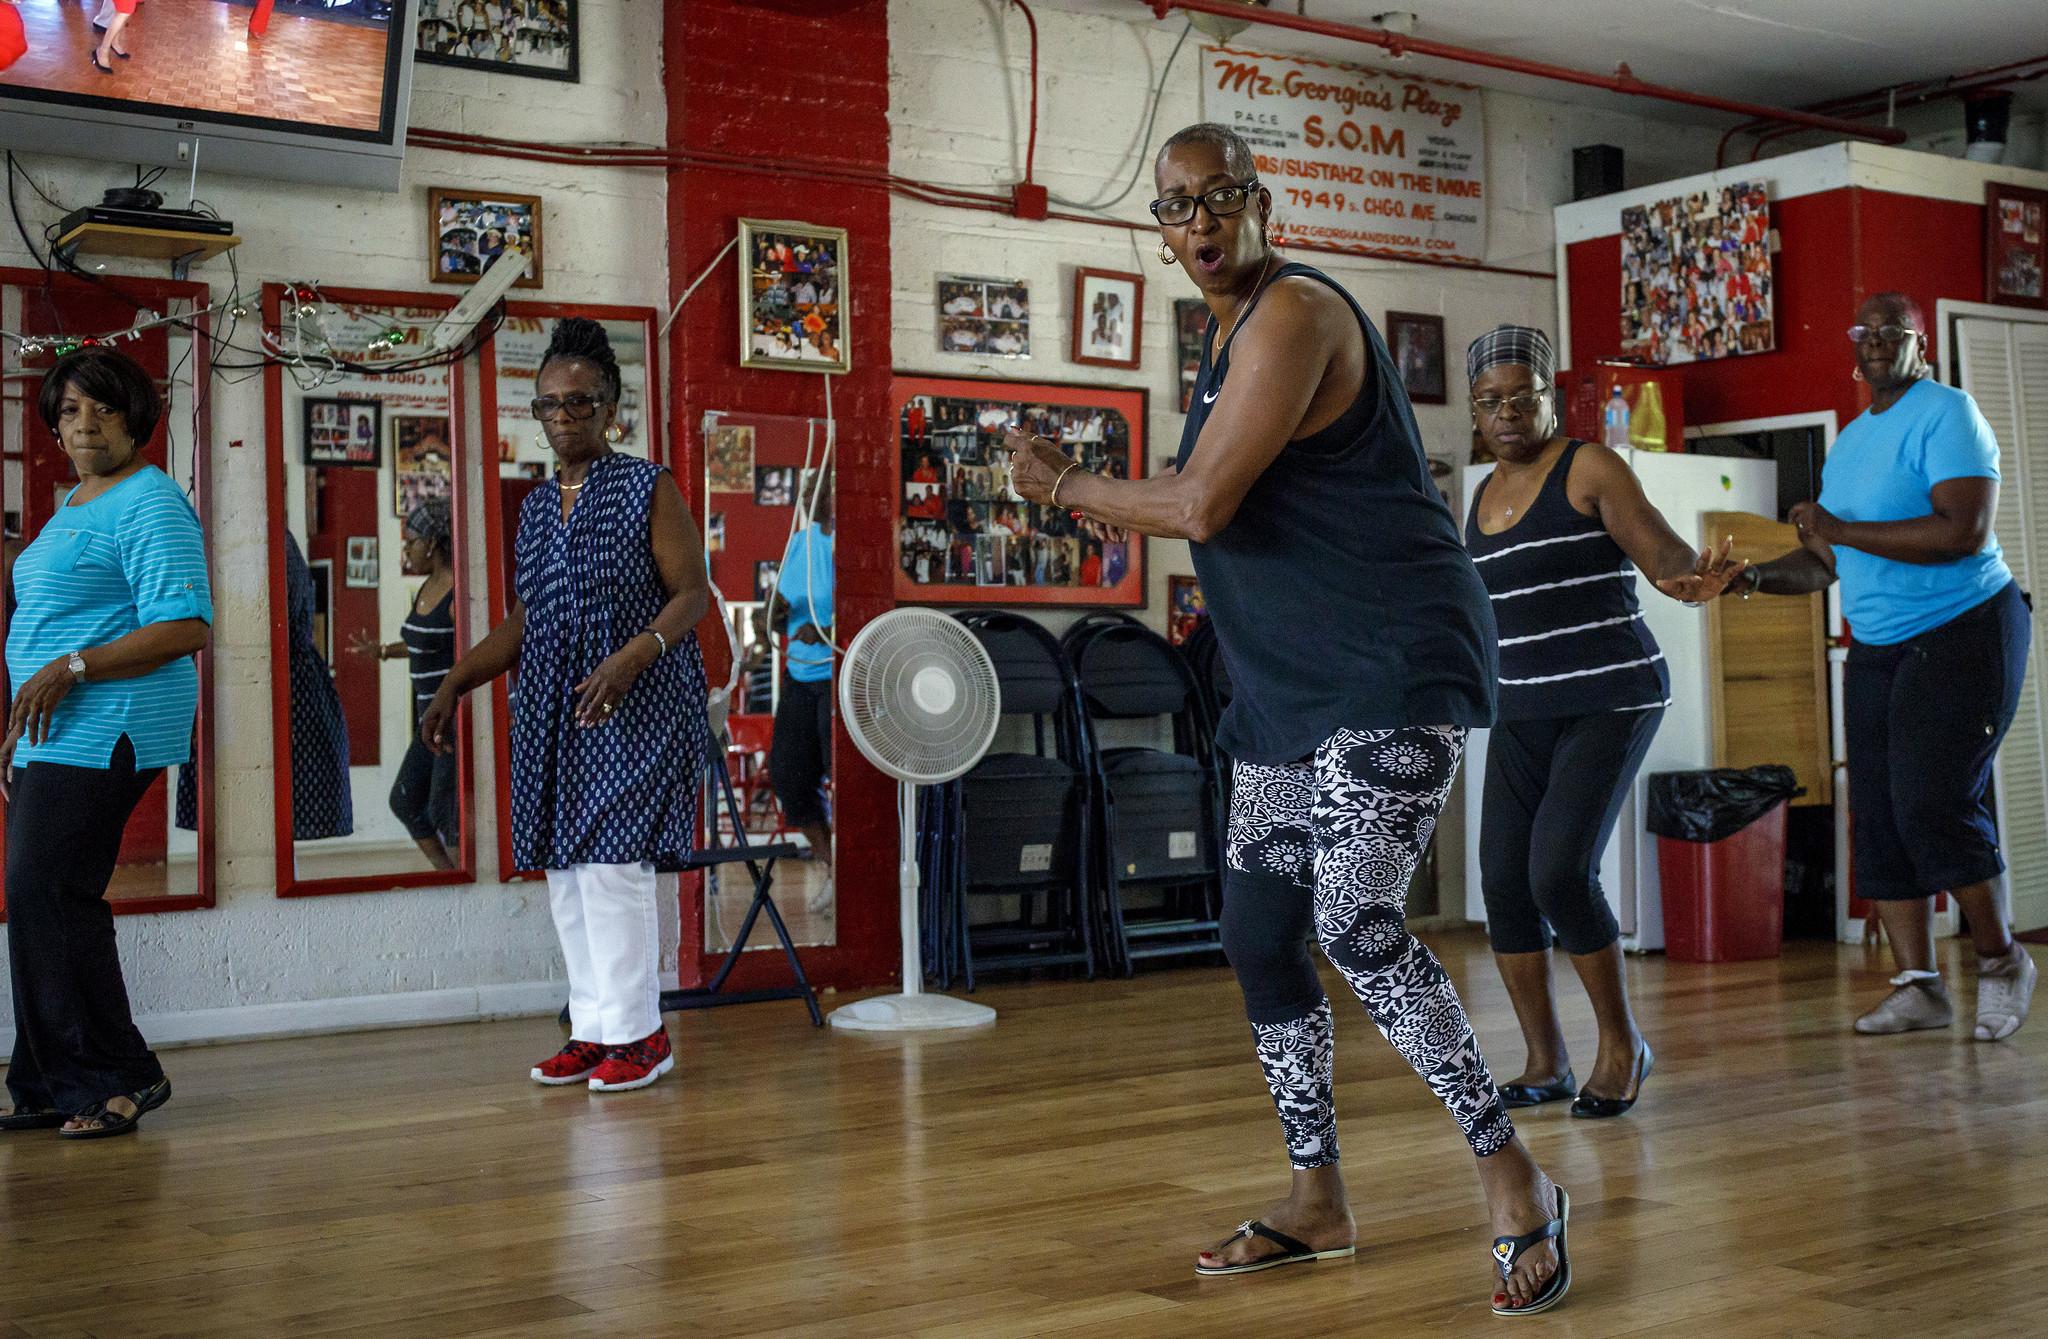 e8fb9cfaac80 The Next Day  Living around gun violence - Chicago Tribune